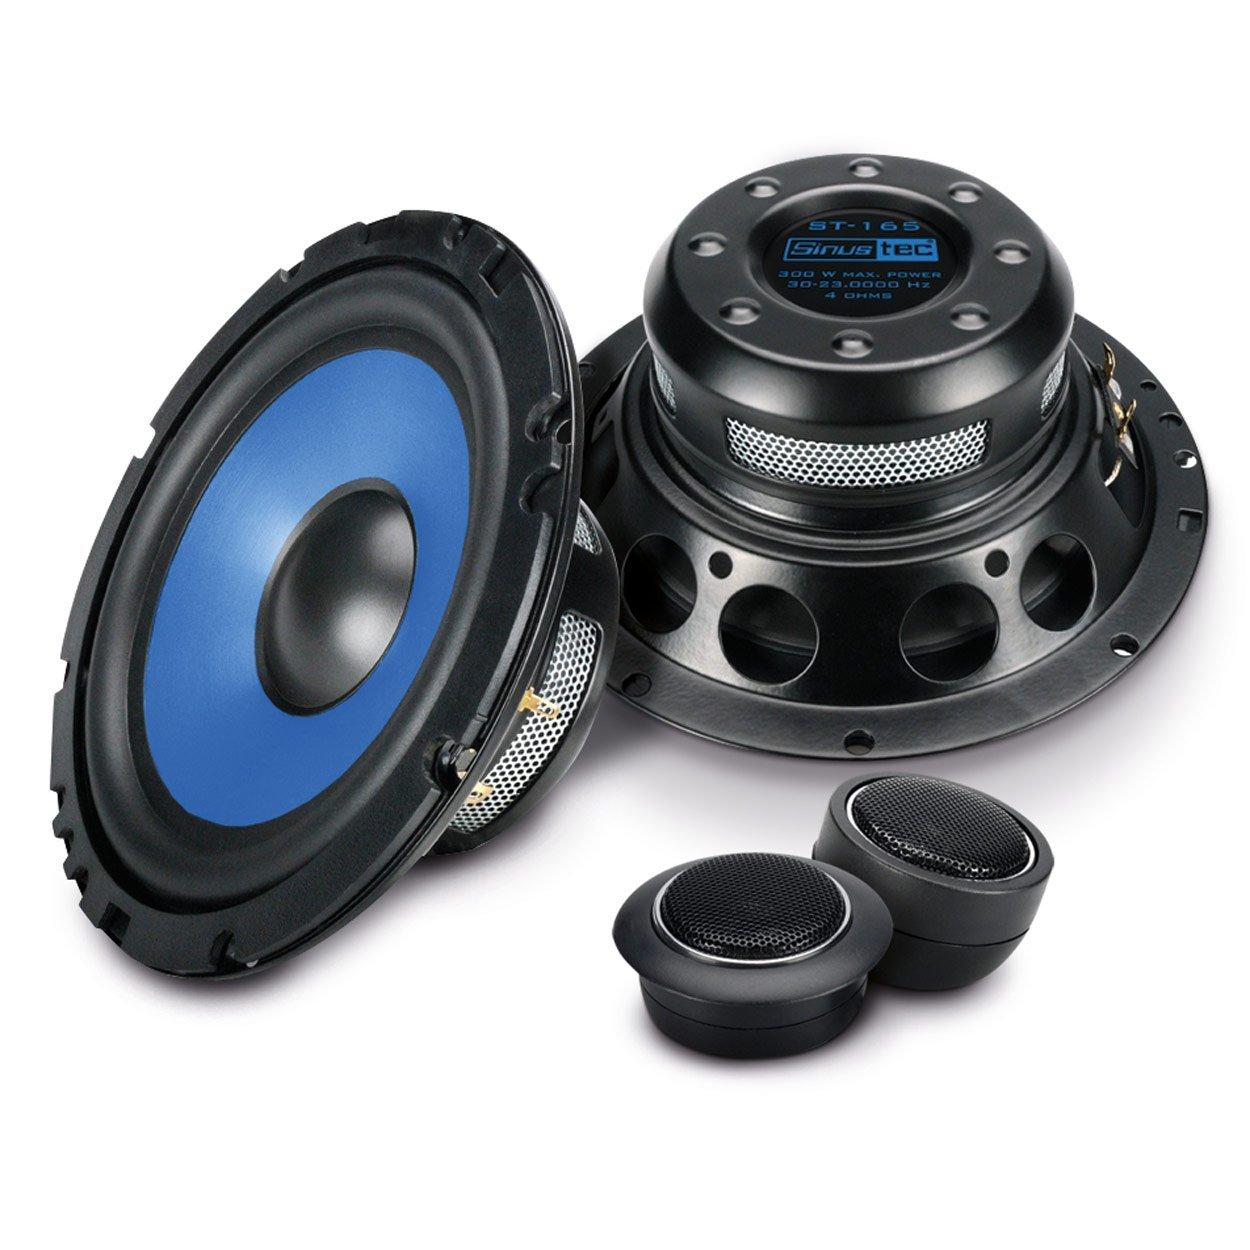 Sinustec 2 Wege Komponenten Lautsprecherboxen rund in 16 cm ...